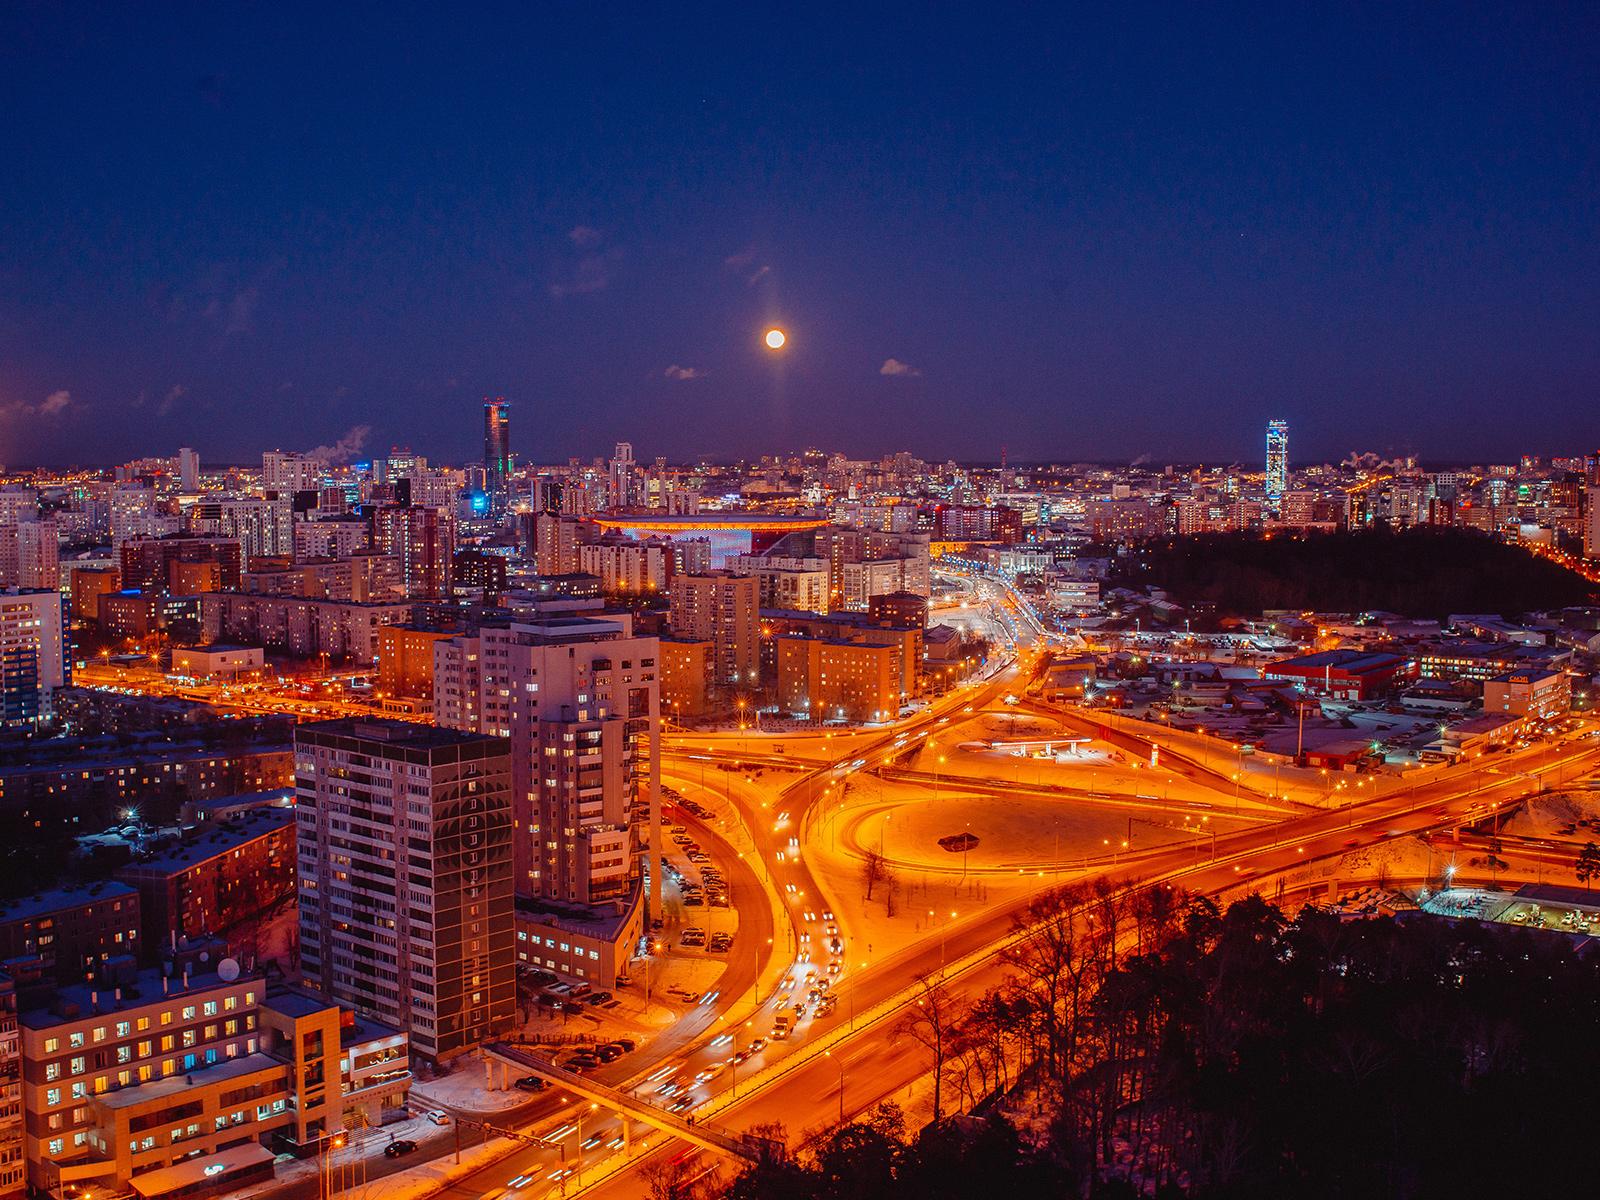 Вид из окон «Репин Парка» на вечерний Екатеринбург